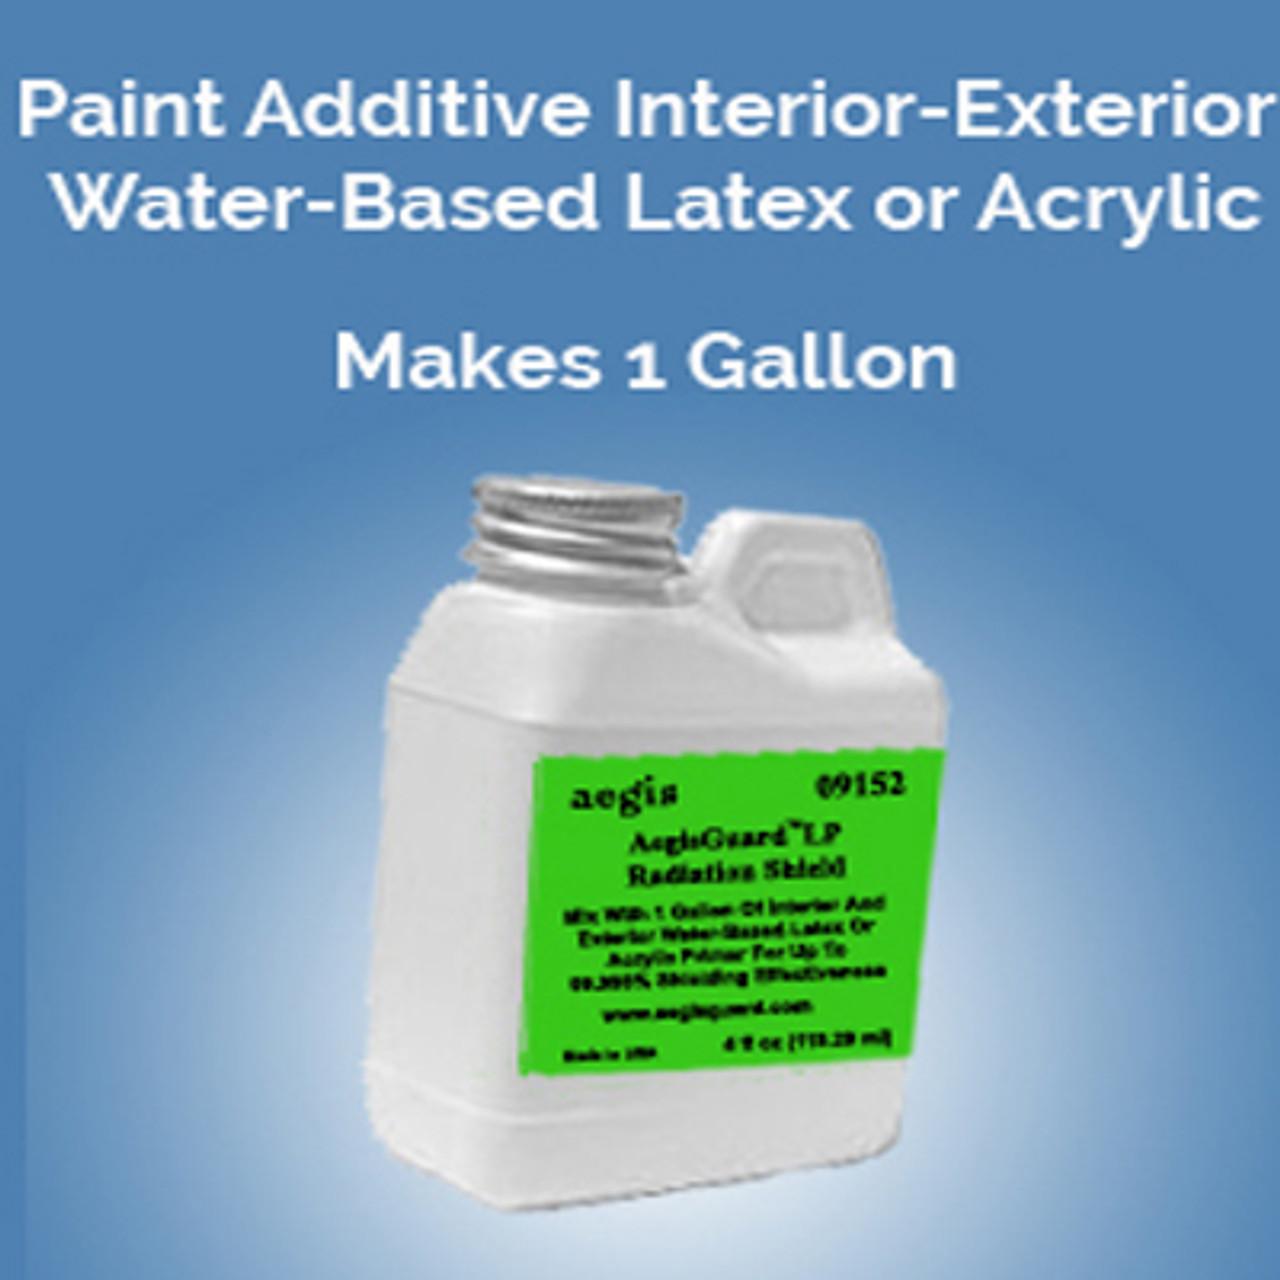 AegisGuard? LP Radiation Shield - Paint Additive - 5 4 oz packs makes 5 gallons